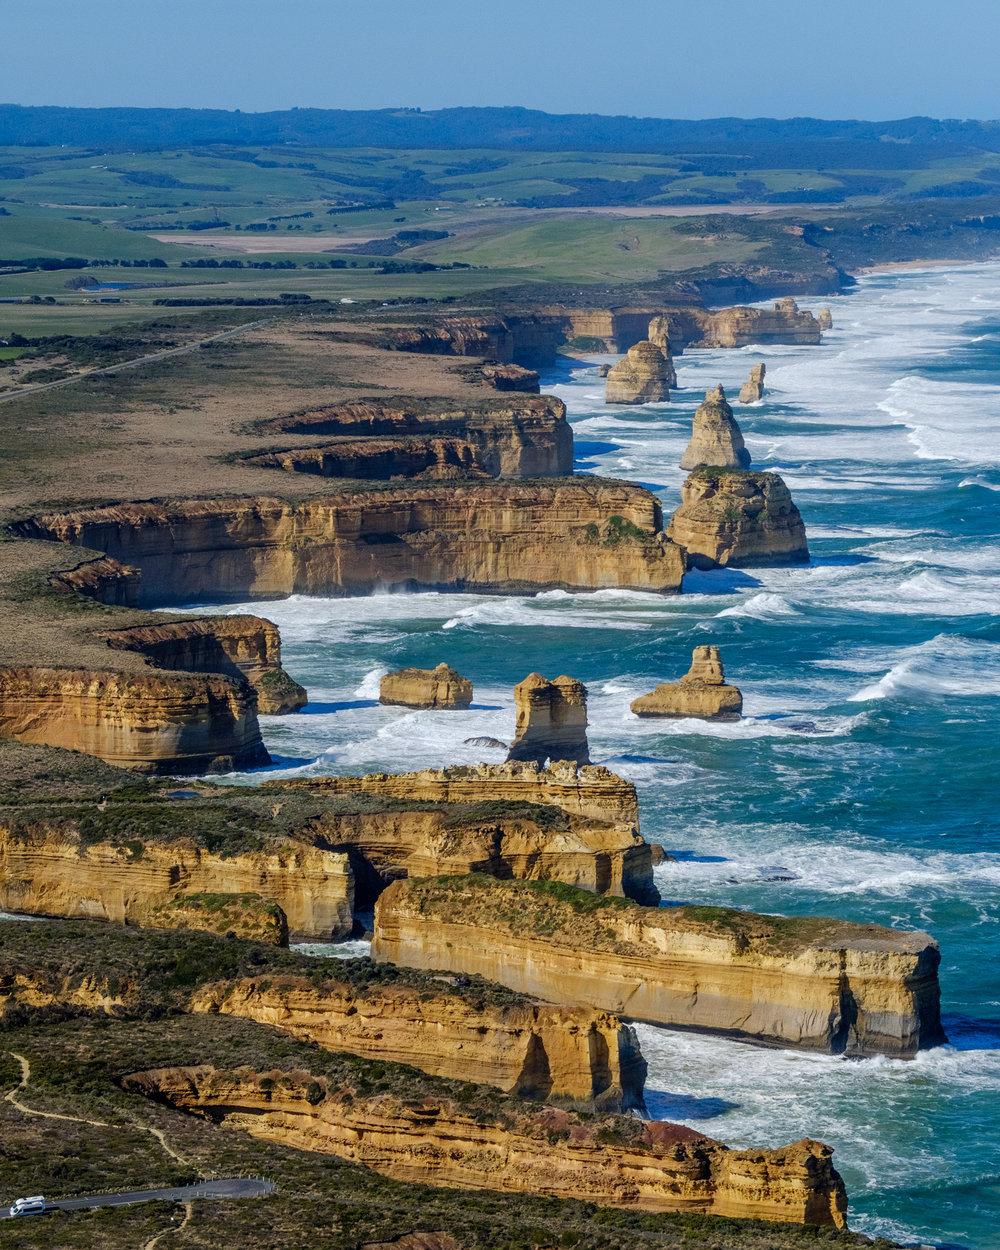 12-apostles-photography-workshop-great-ocean-road-06